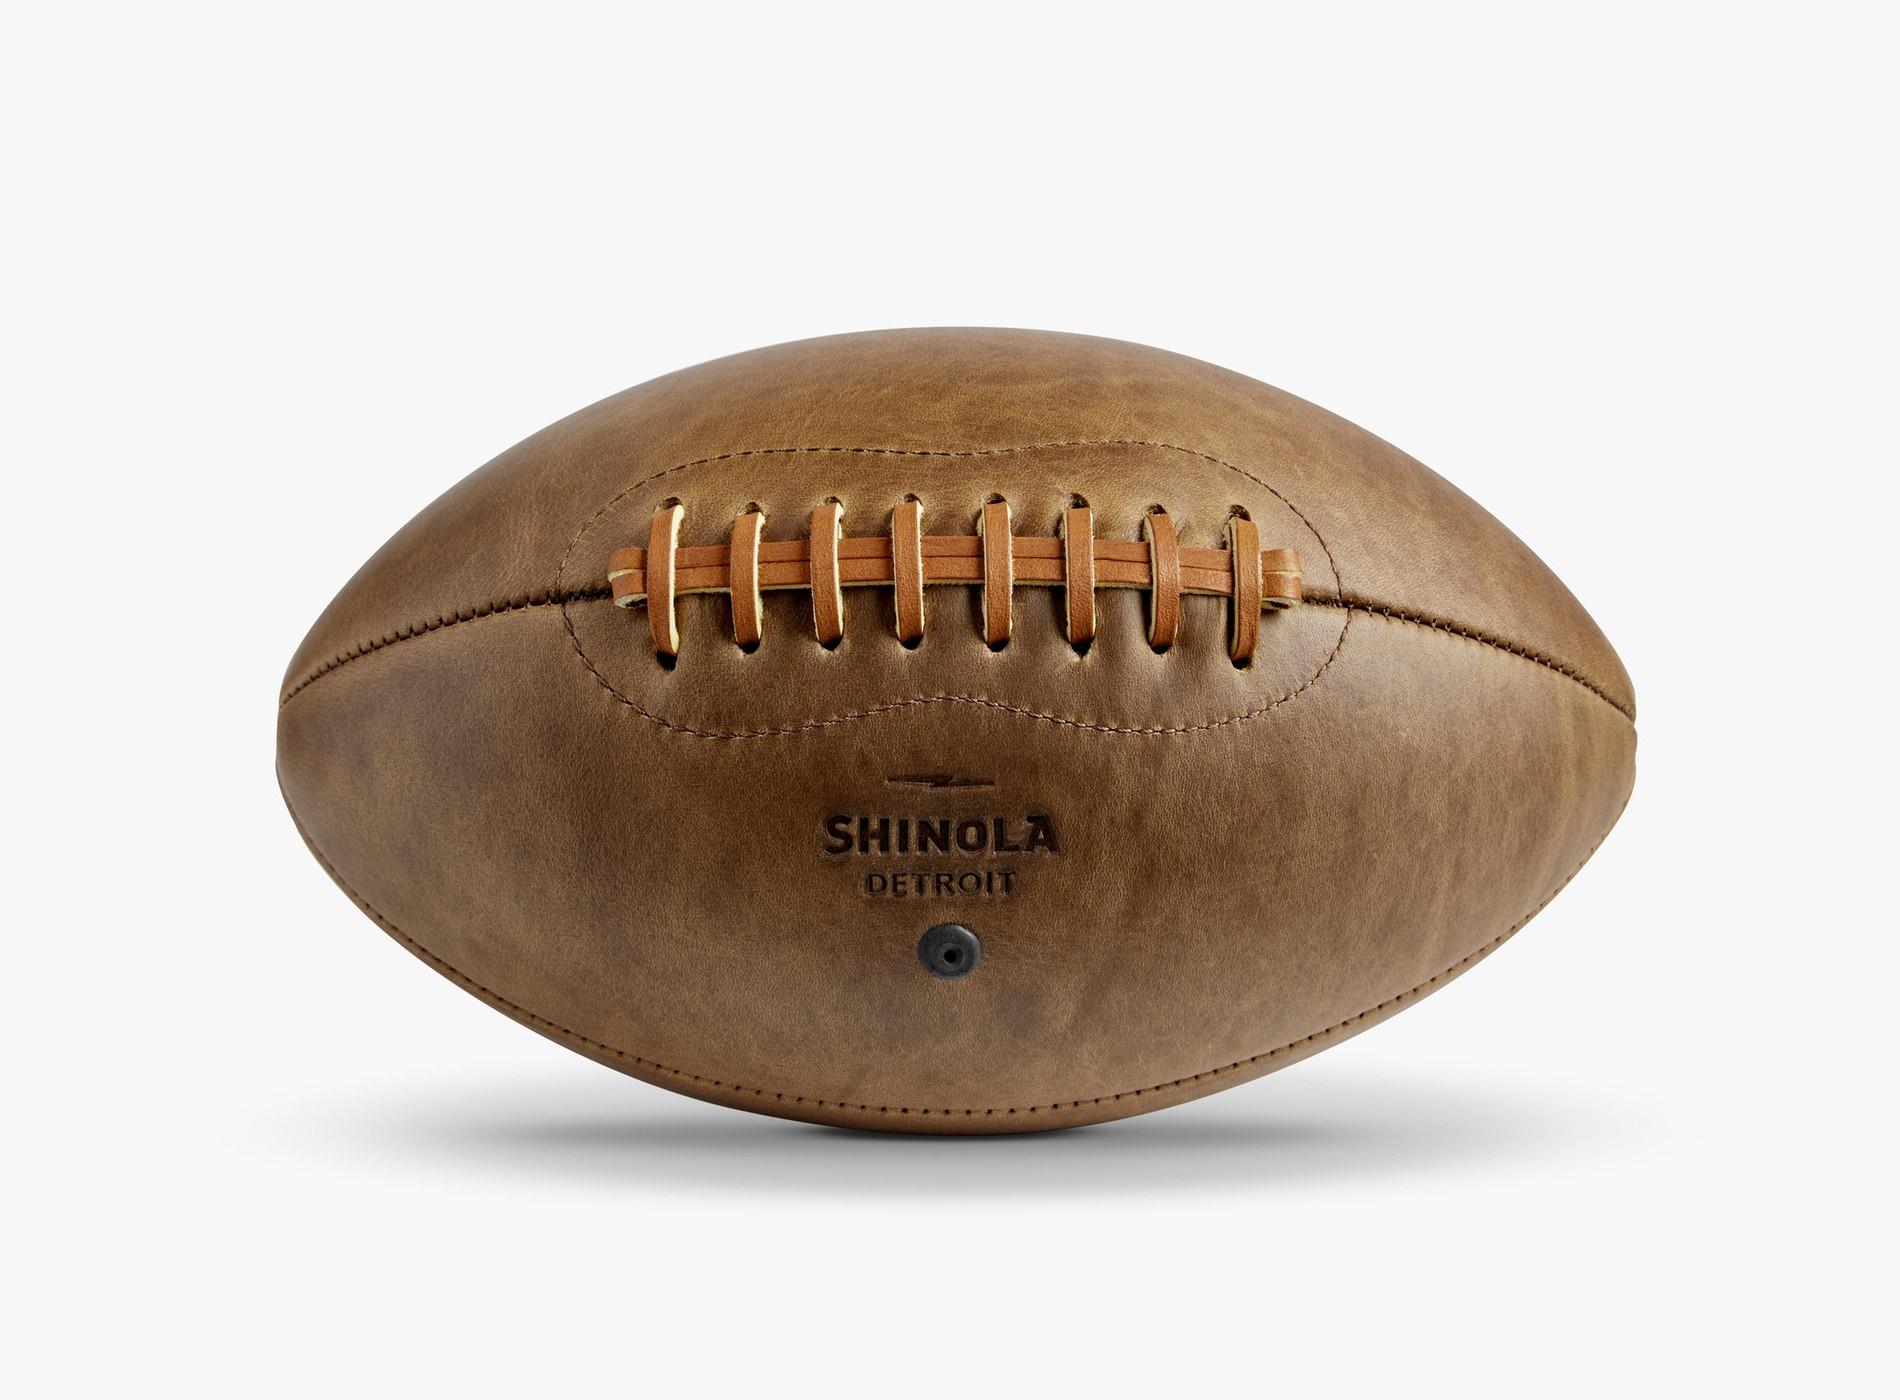 Guide Noël 2019 Idées Cadeaux Shinola Ballon Football Cuir